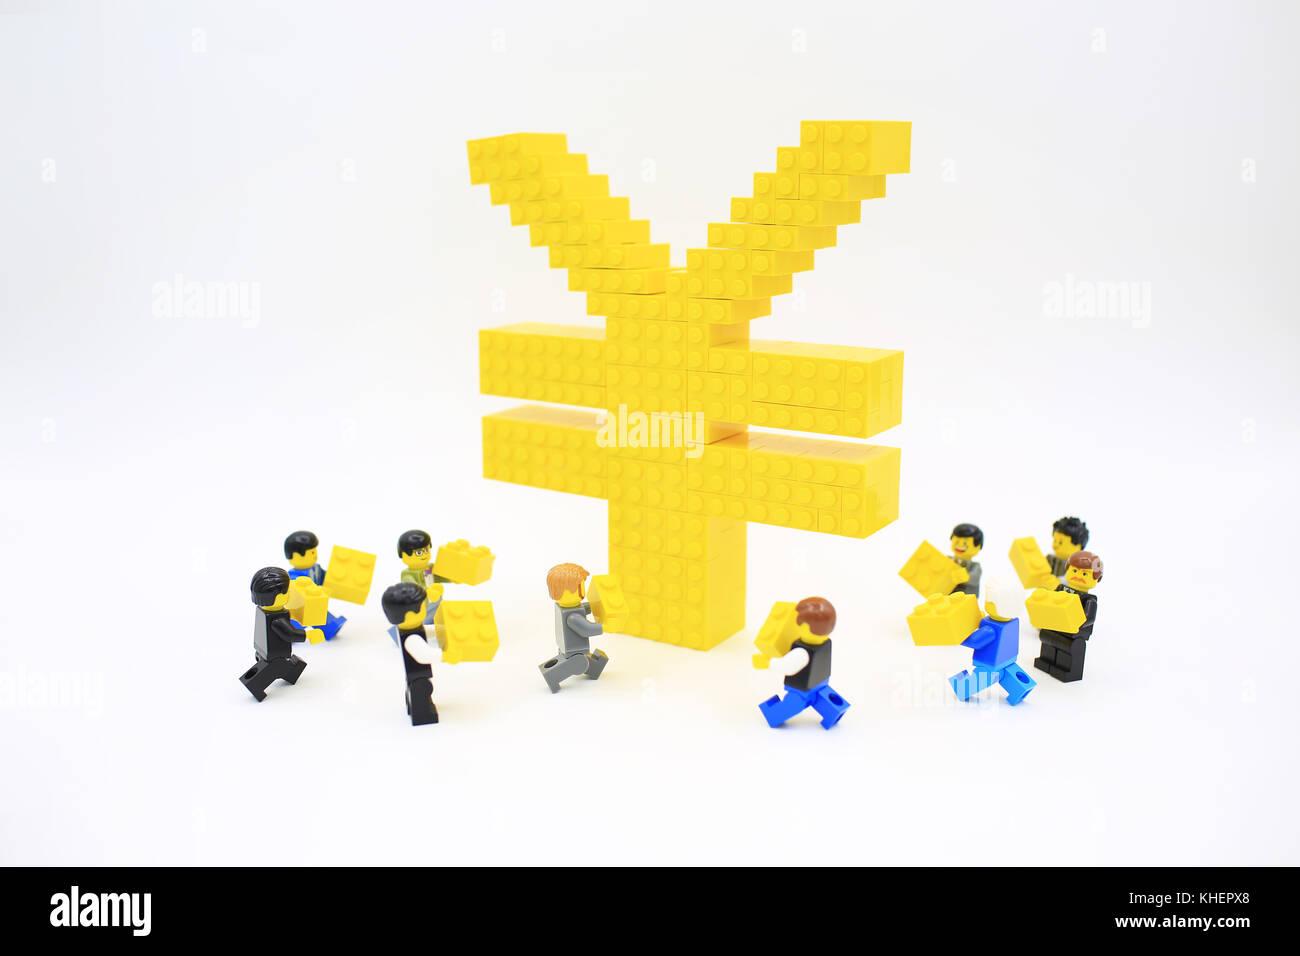 Japanese yen symbol stock photos japanese yen symbol stock yen japanese money with minifugure lego stock image biocorpaavc Choice Image